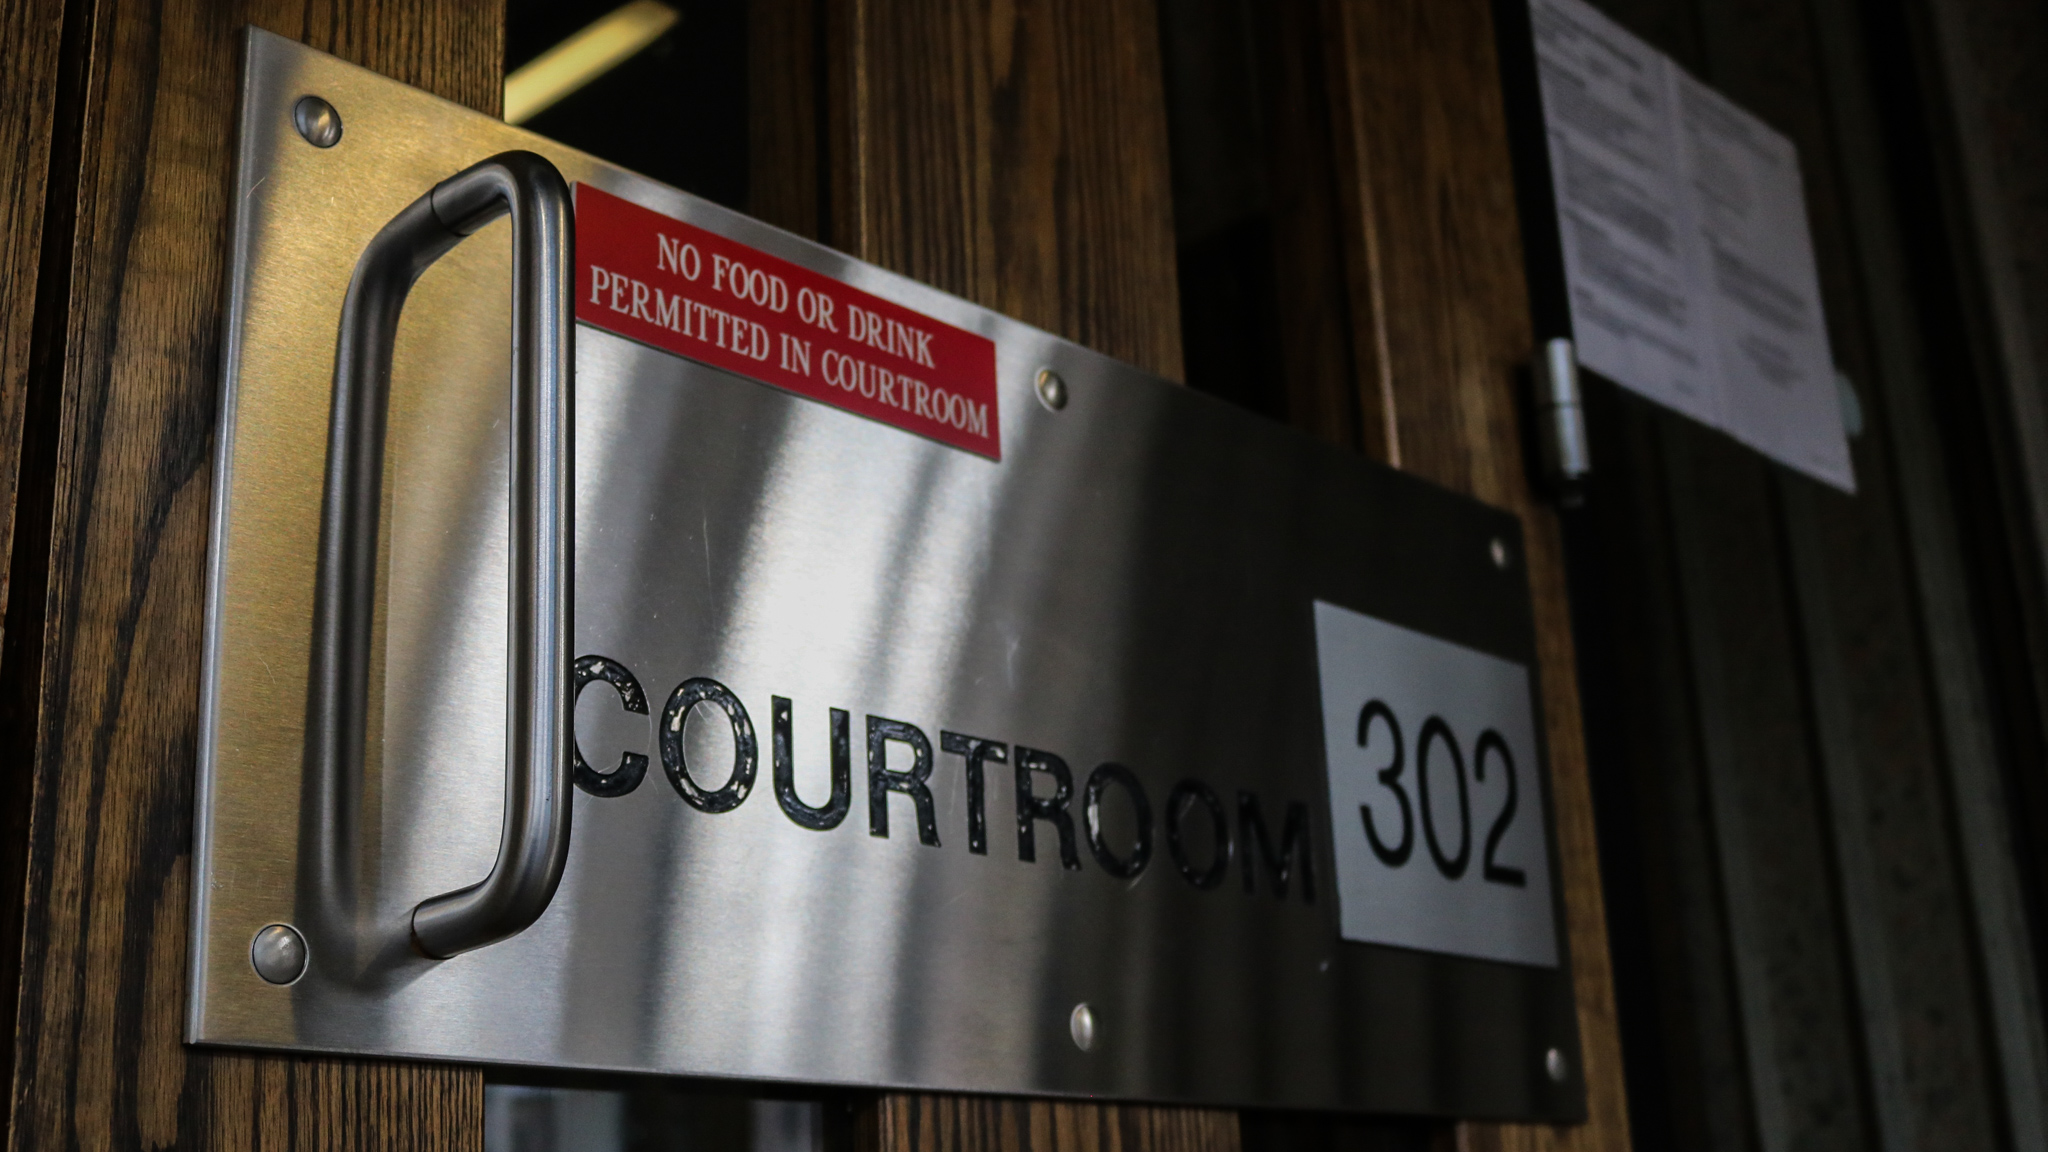 Calvin Joel (CJ) Maynard Sparks and Samanda Rose Ritch were sentenced in Nova Scotia Supreme Court on Friday.